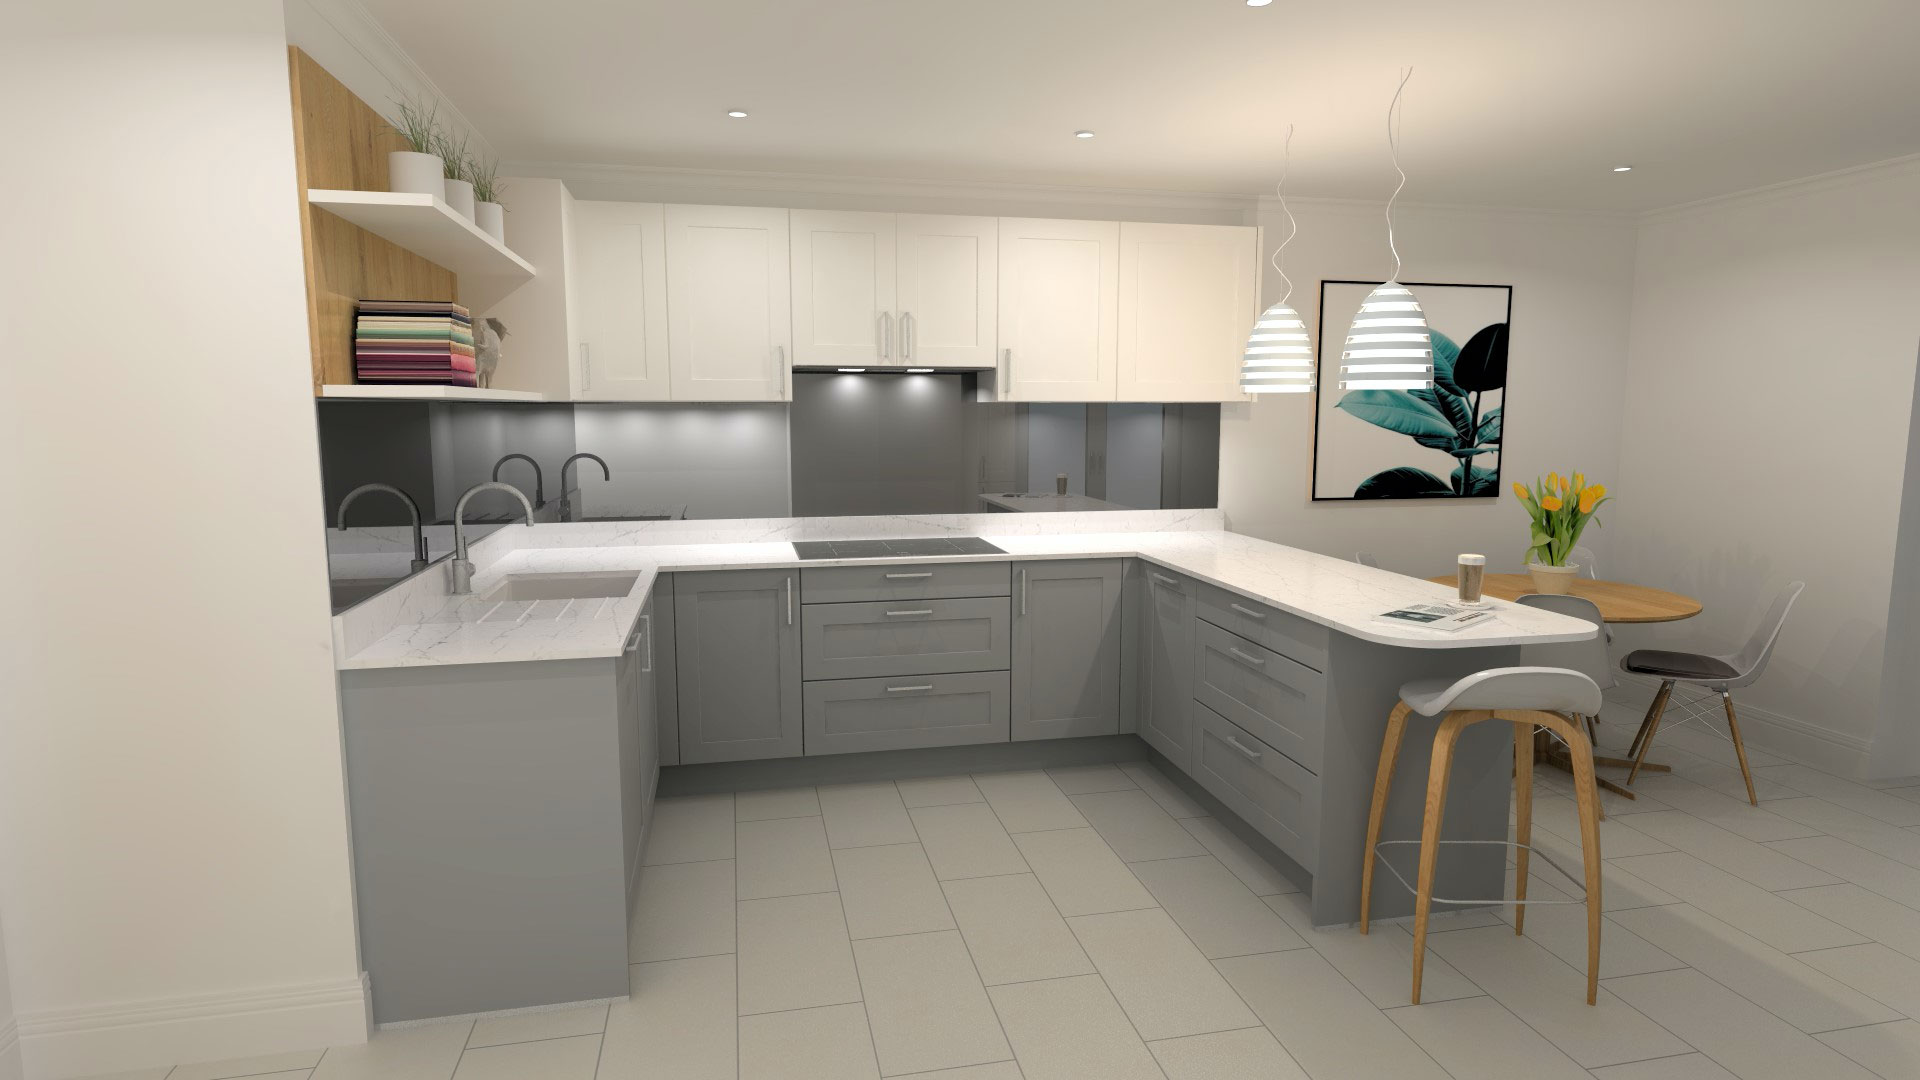 Amberstone Developments Sandgate house kitchen 2